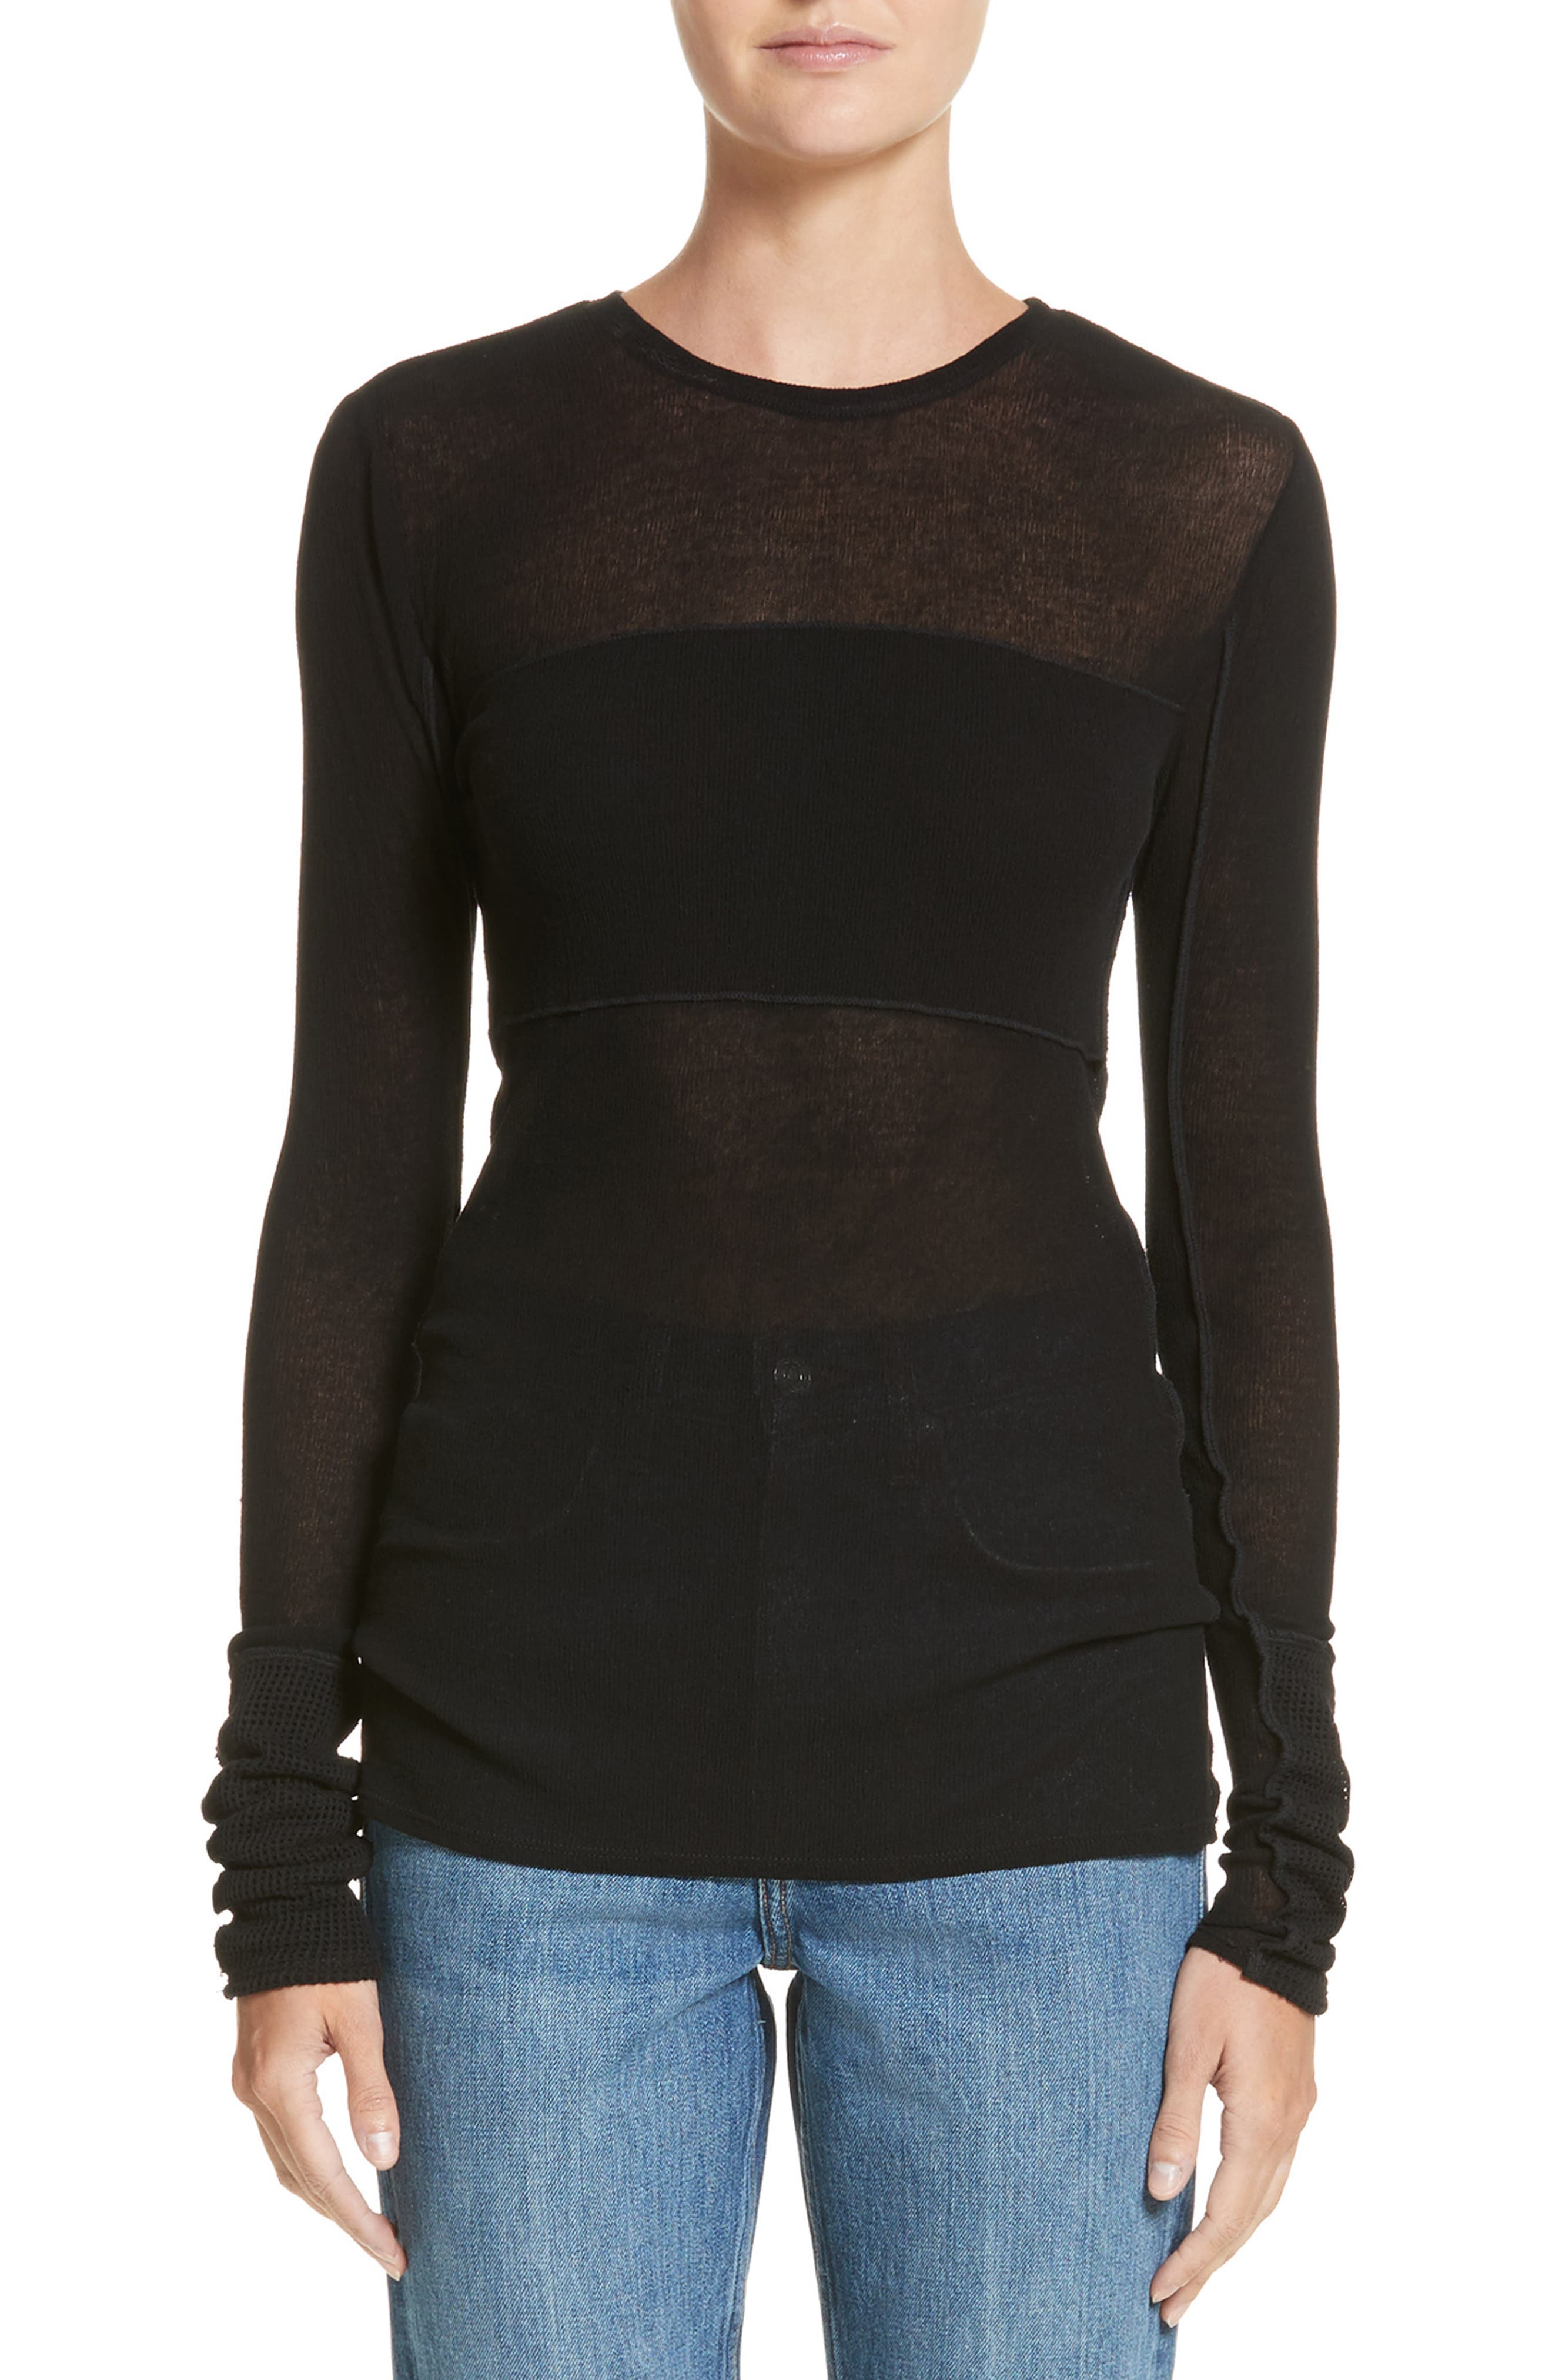 PSWL Illusion Jersey Gauze Top,                         Main,                         color, Black